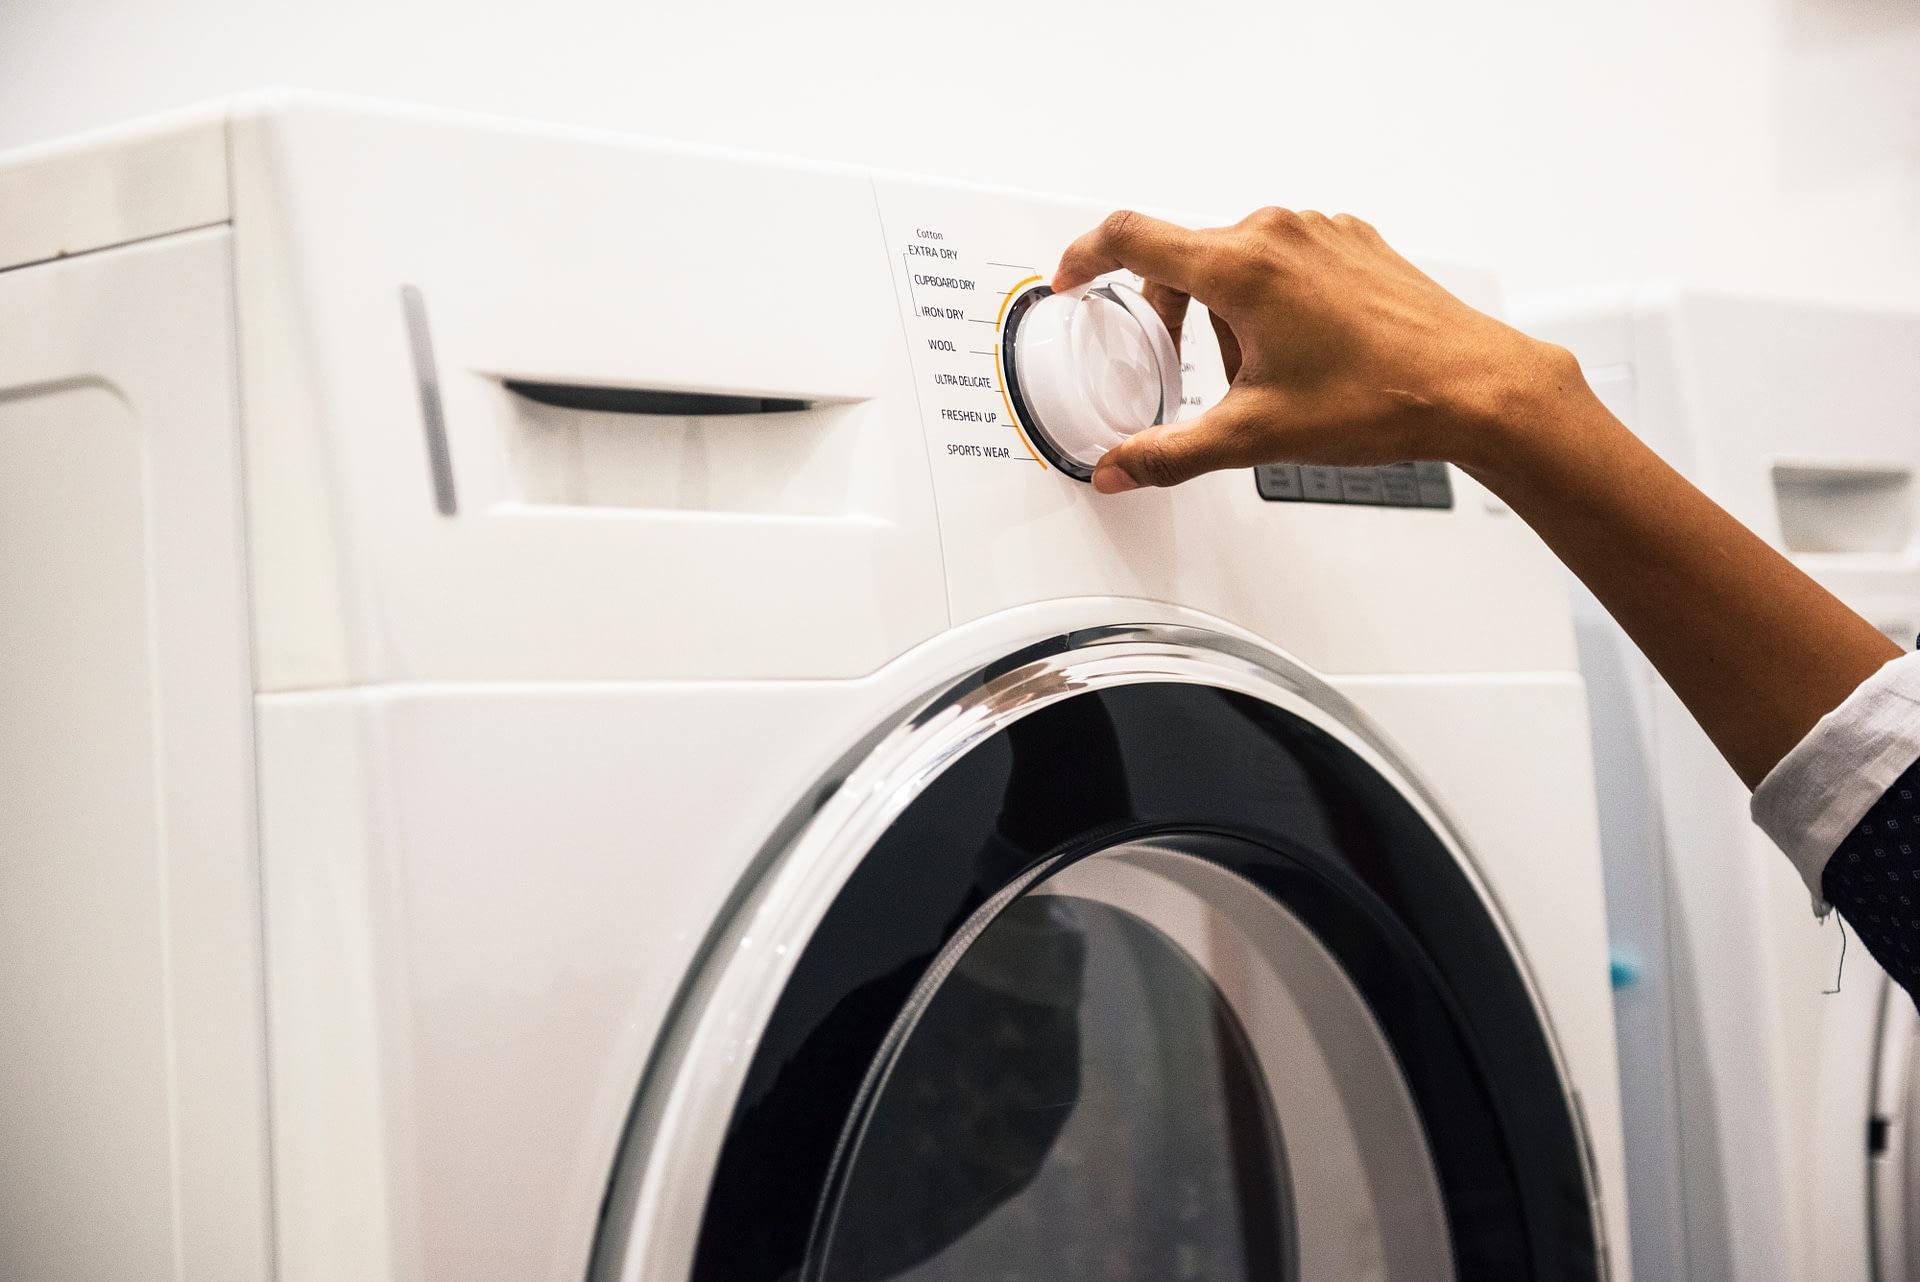 Woman using epsom salt to clean her washing machine